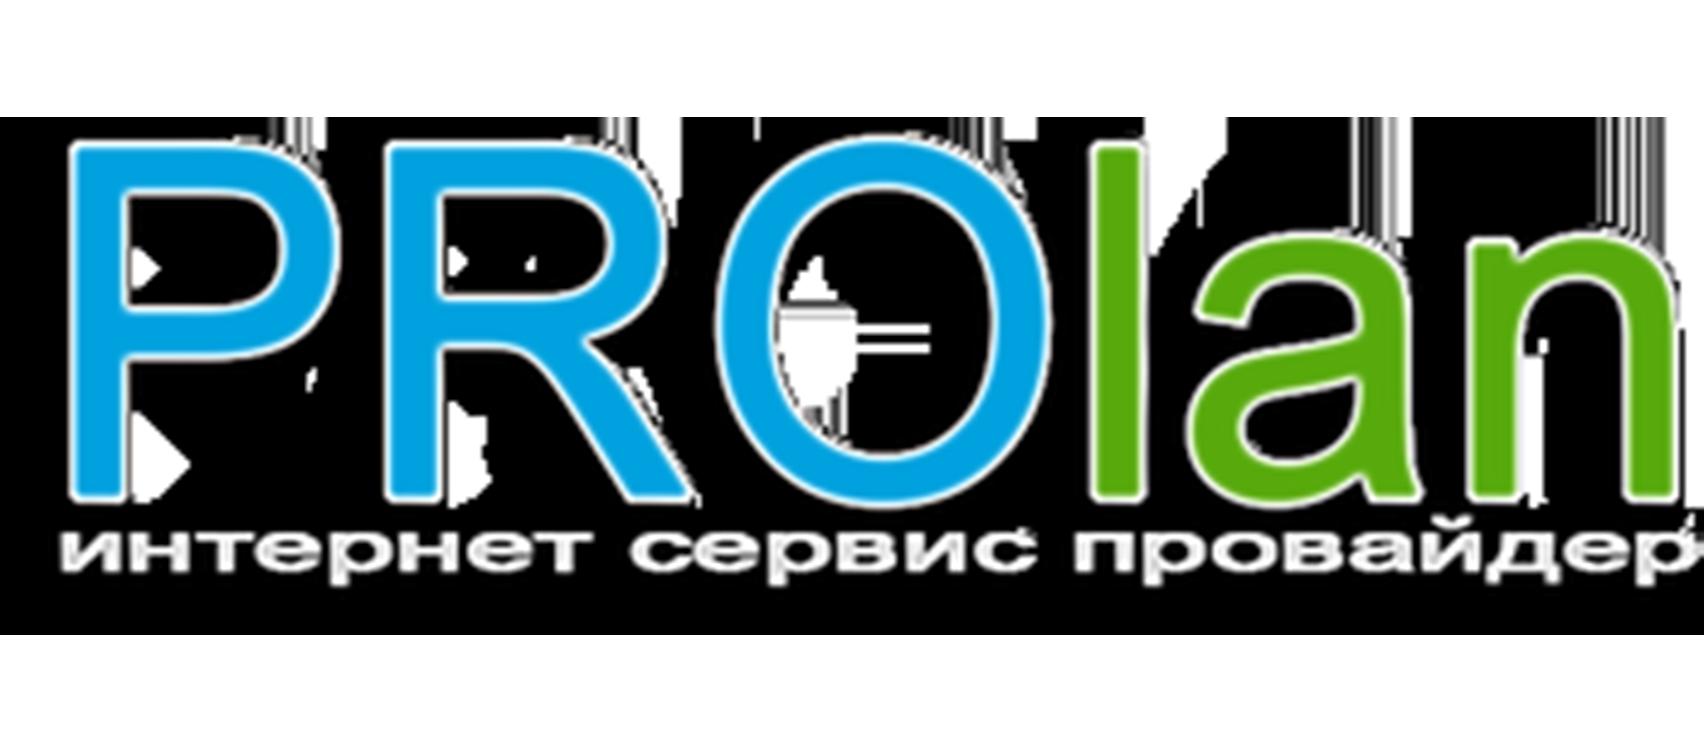 Prolan (Киев)